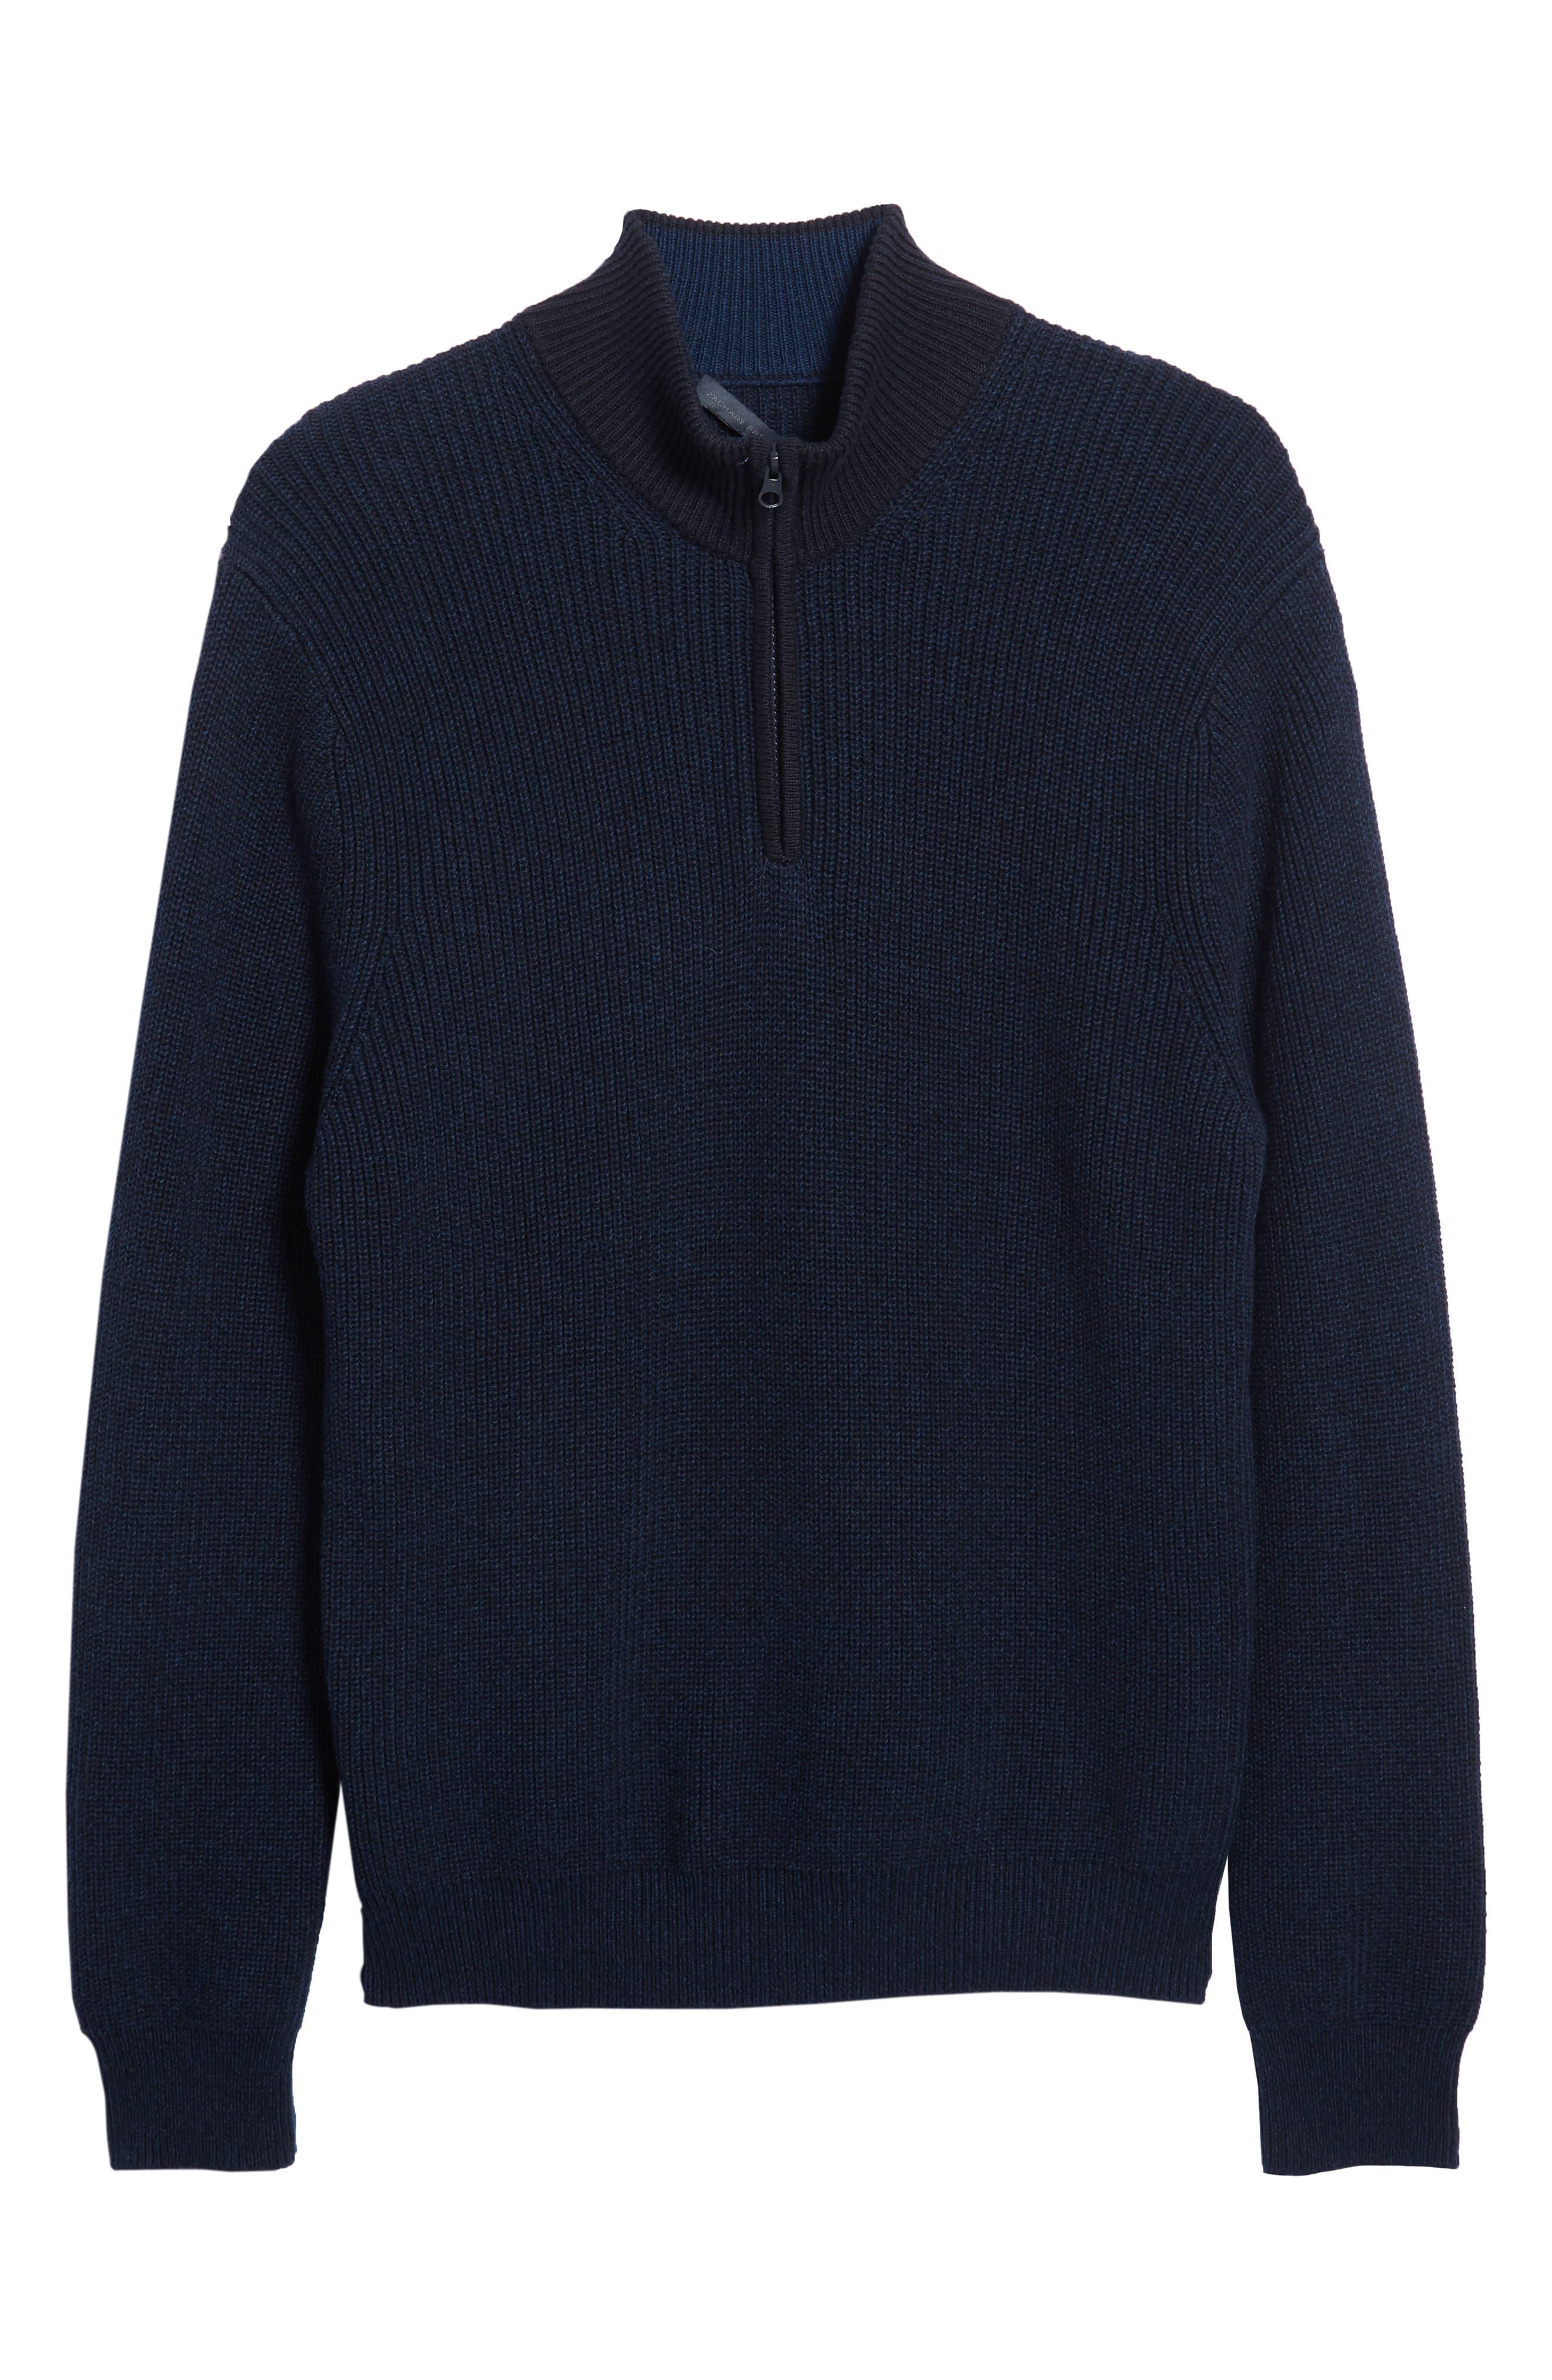 Fillmore Quarter Zip Sweater,                             Alternate thumbnail 6, color,                             NAVY